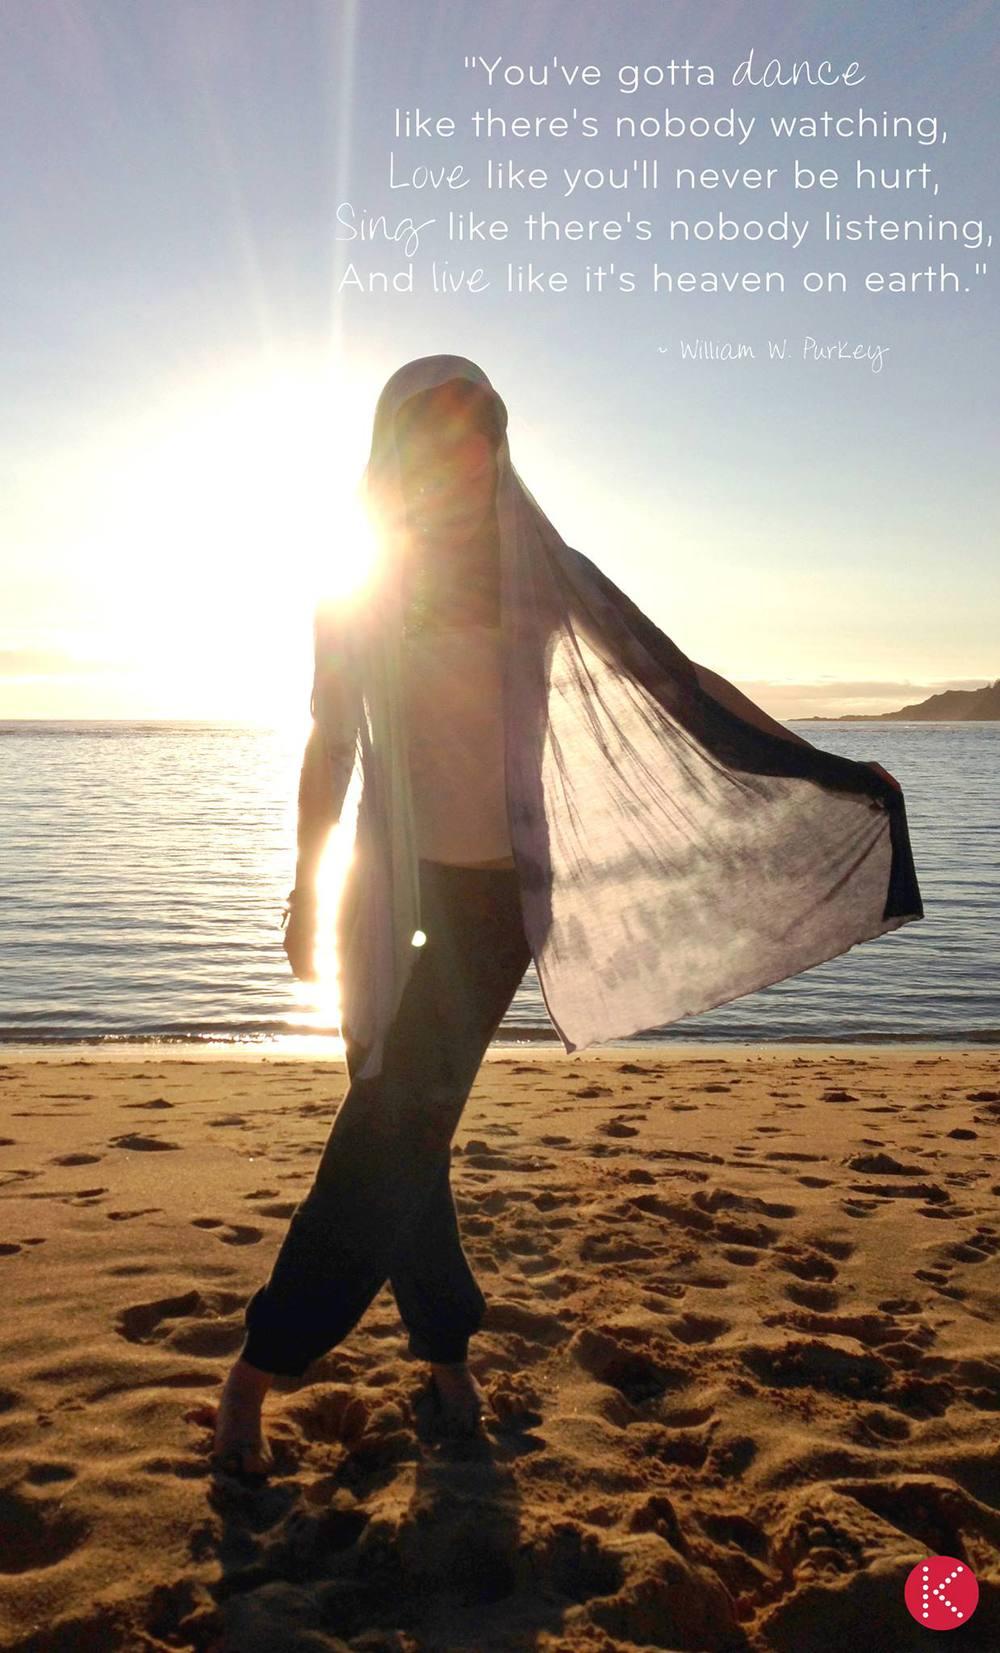 Rachel shawl dancing.jpg